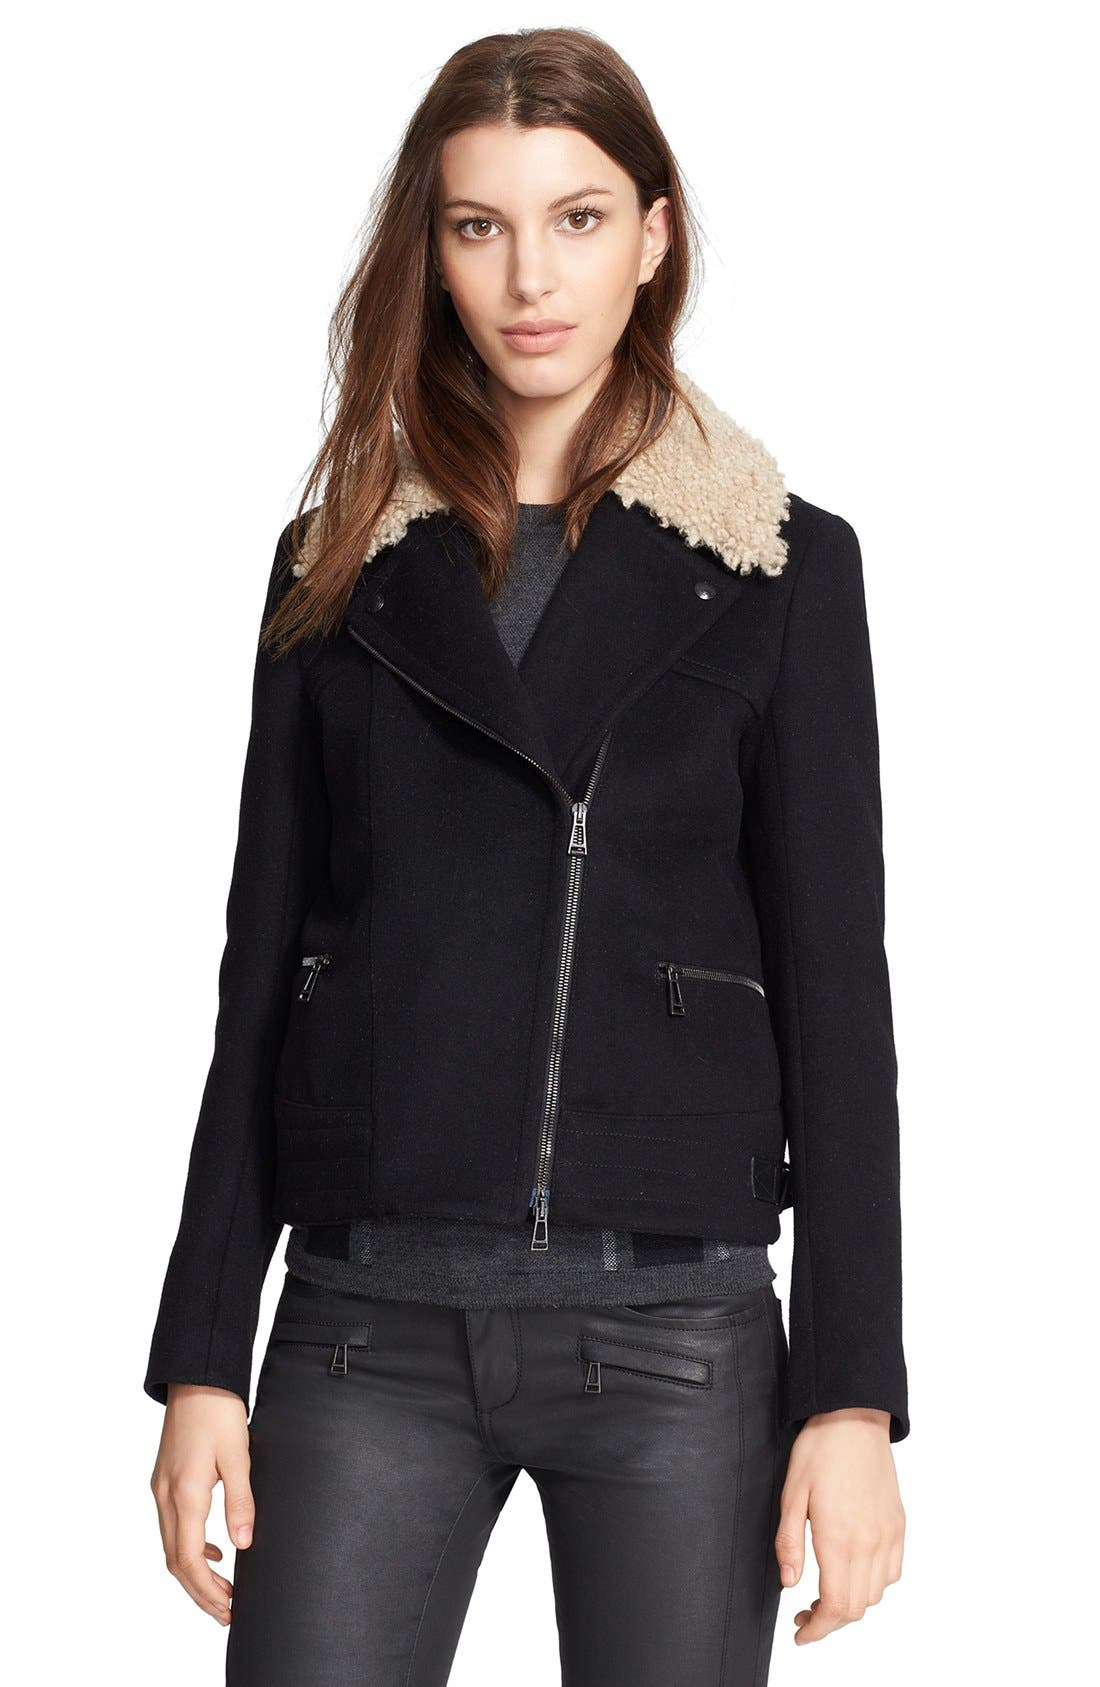 Alternate Image 1 Selected - Belstaff 'Kingsley' Lightweight Tweed Moto Jacket with Genuine Shearling Collar